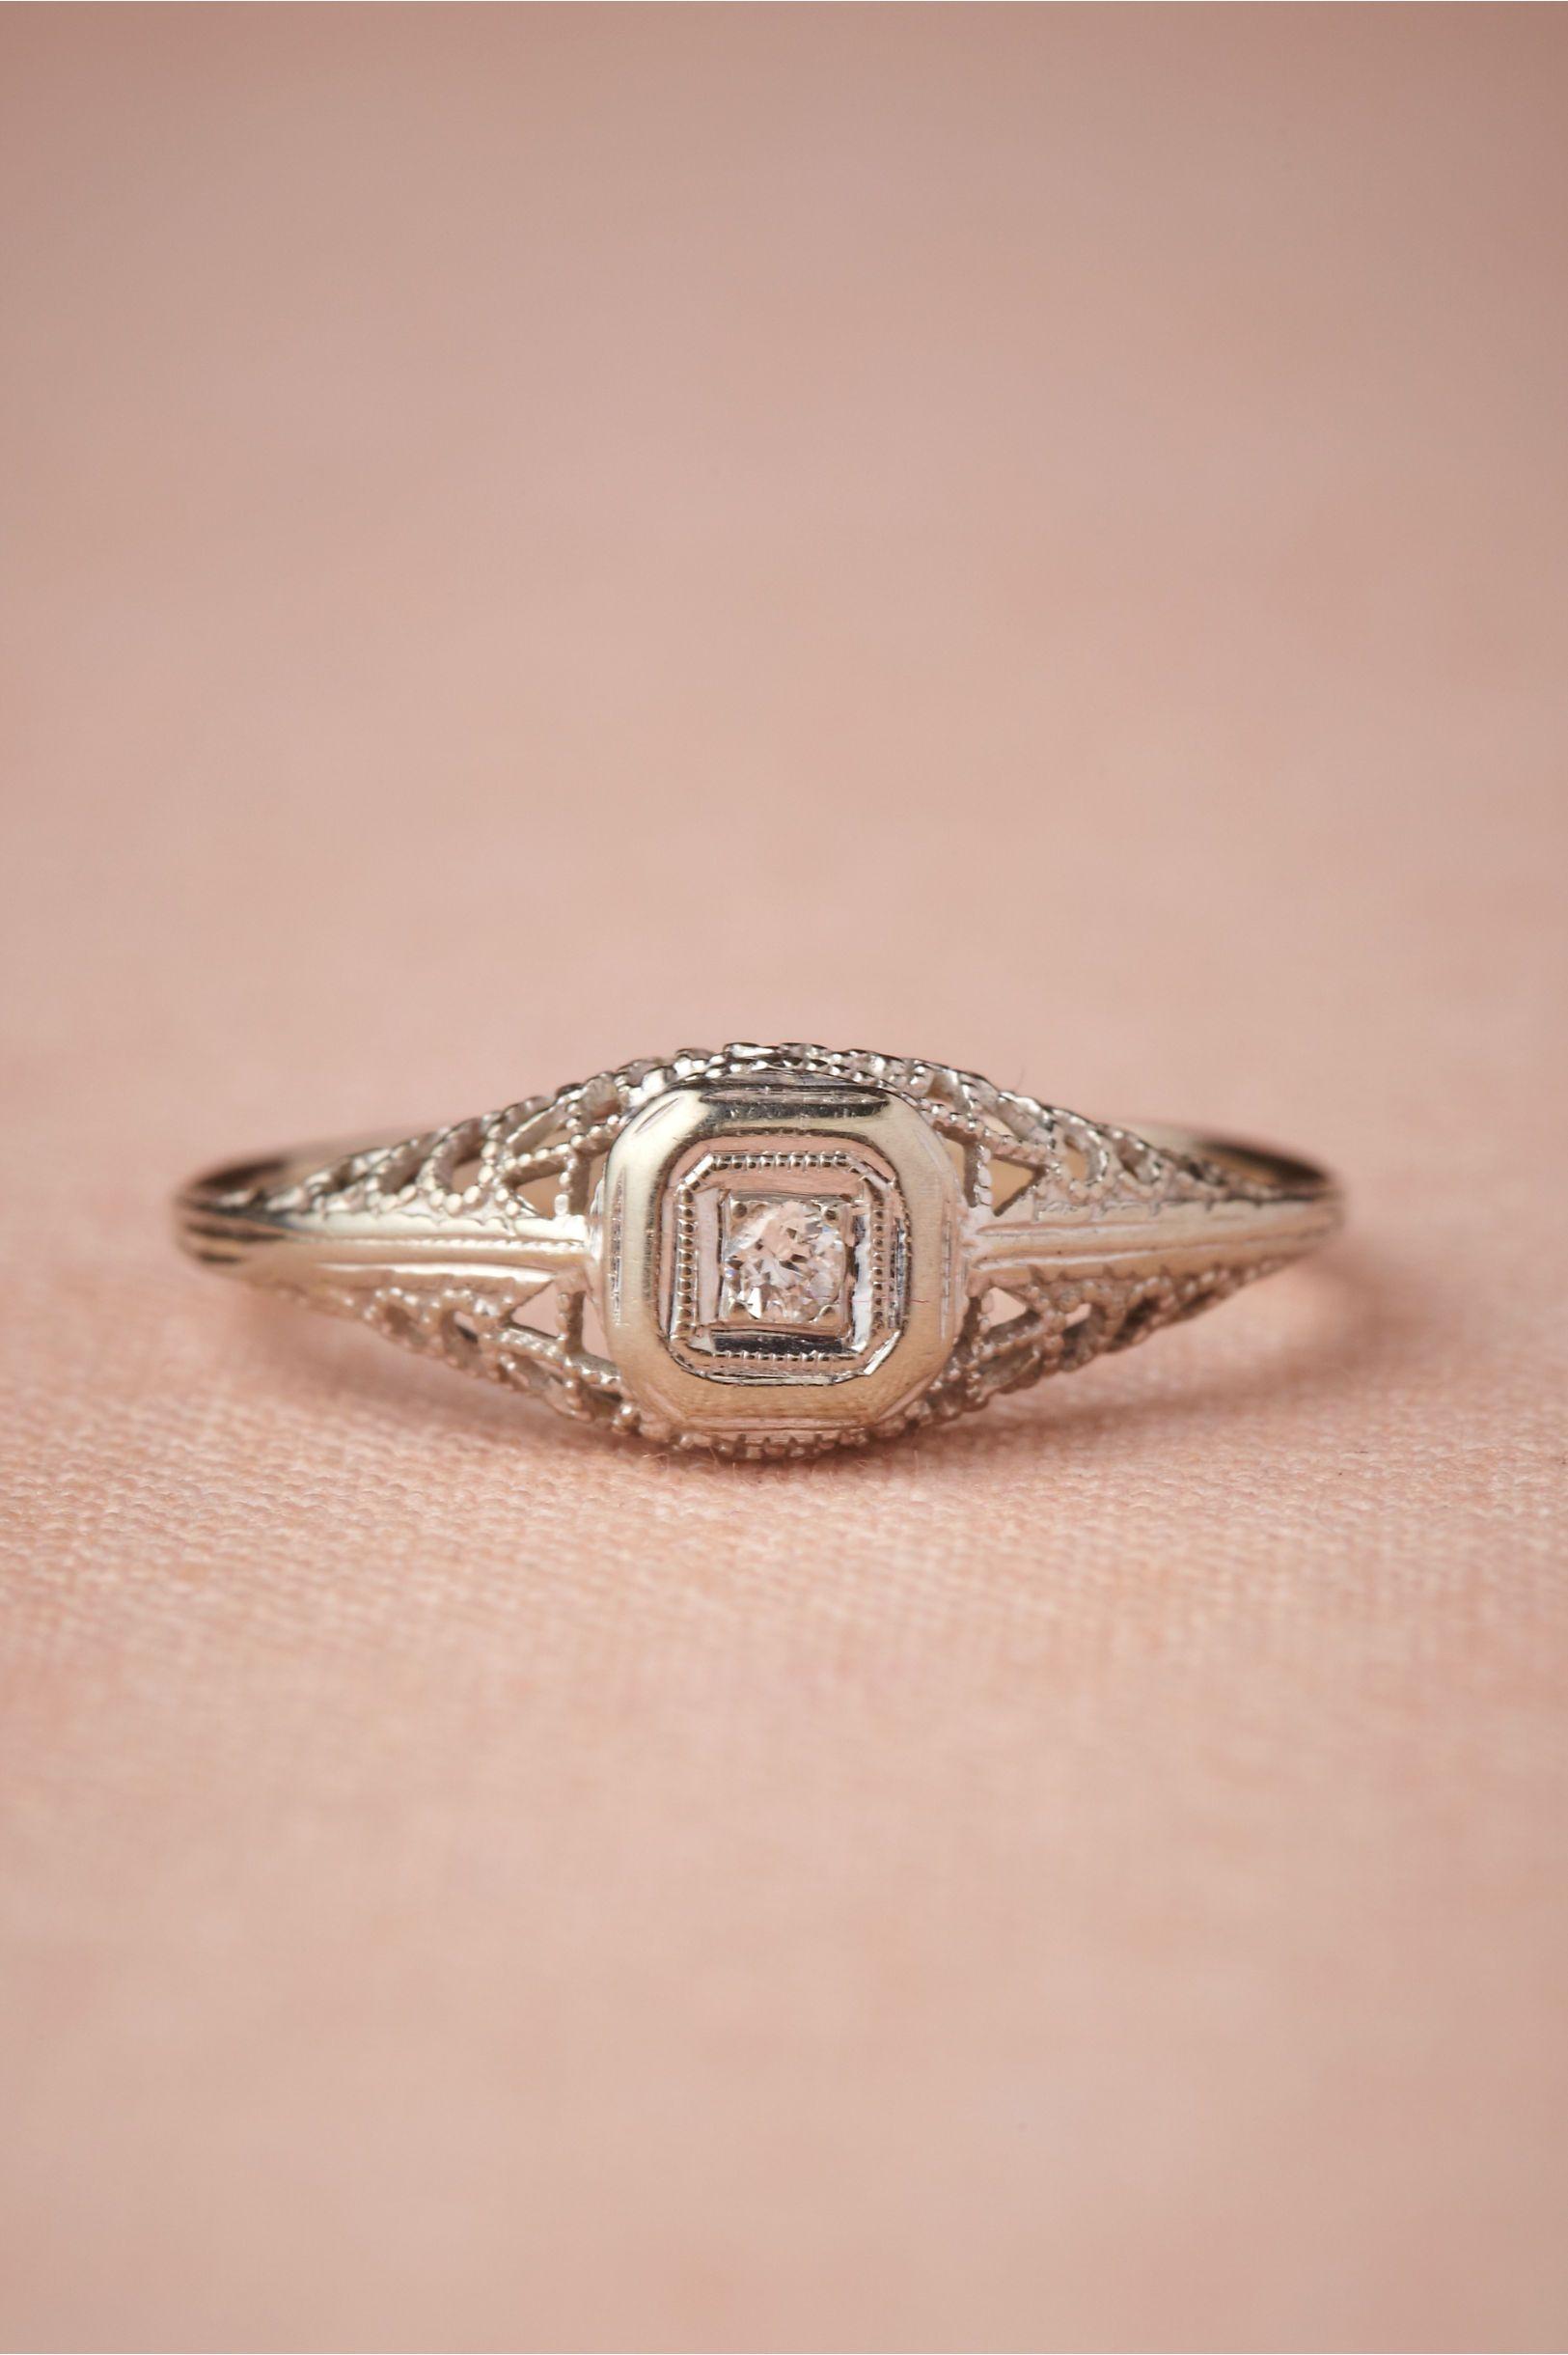 Lyrical Framework Ring in SHOP The Bride Bridal Jewelry at BHLDN ...